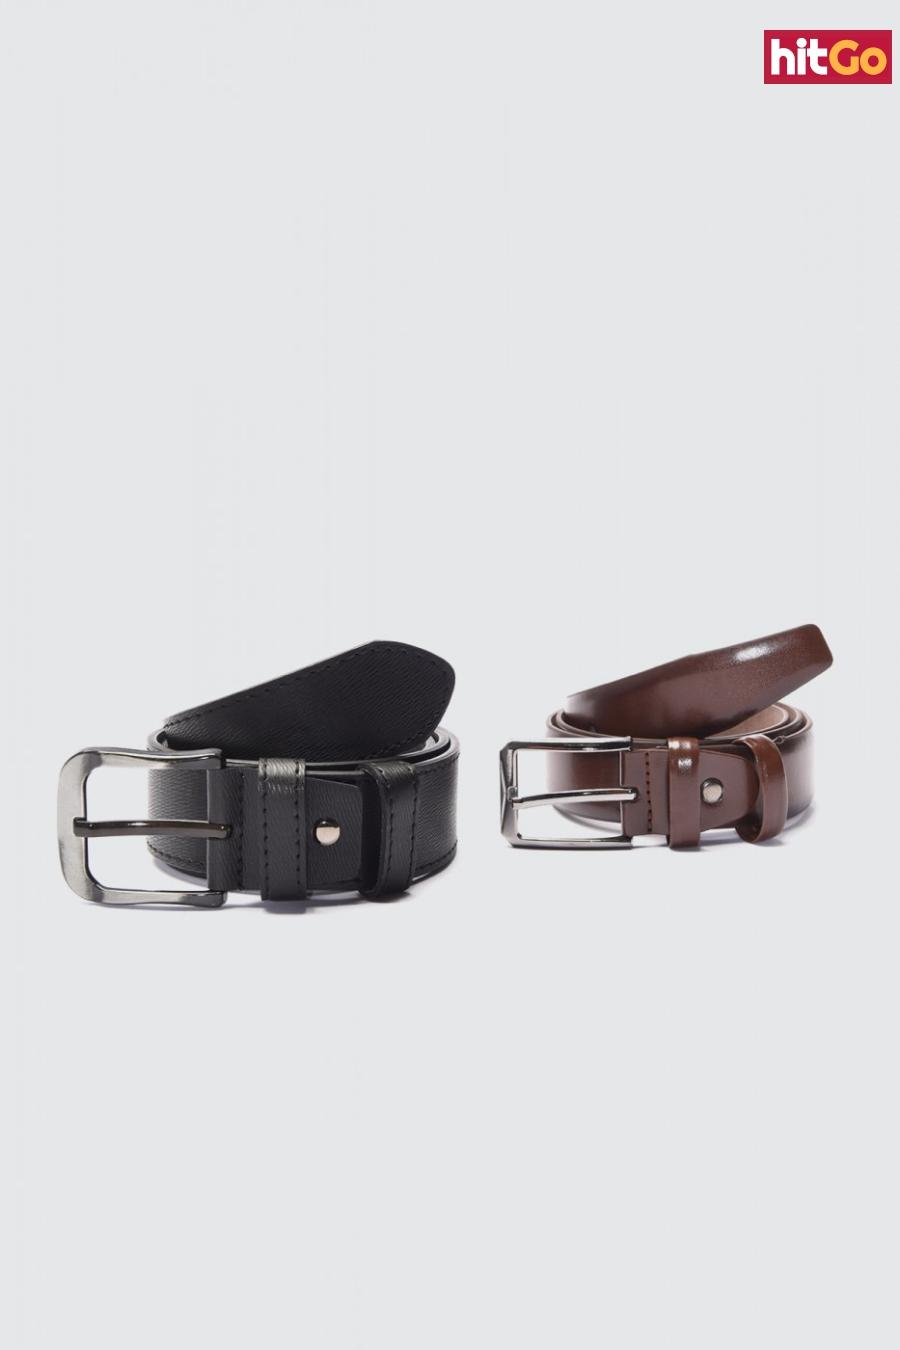 Trendyol Multicolored Mens 2-way FD Leather Belt pánské 135 cm